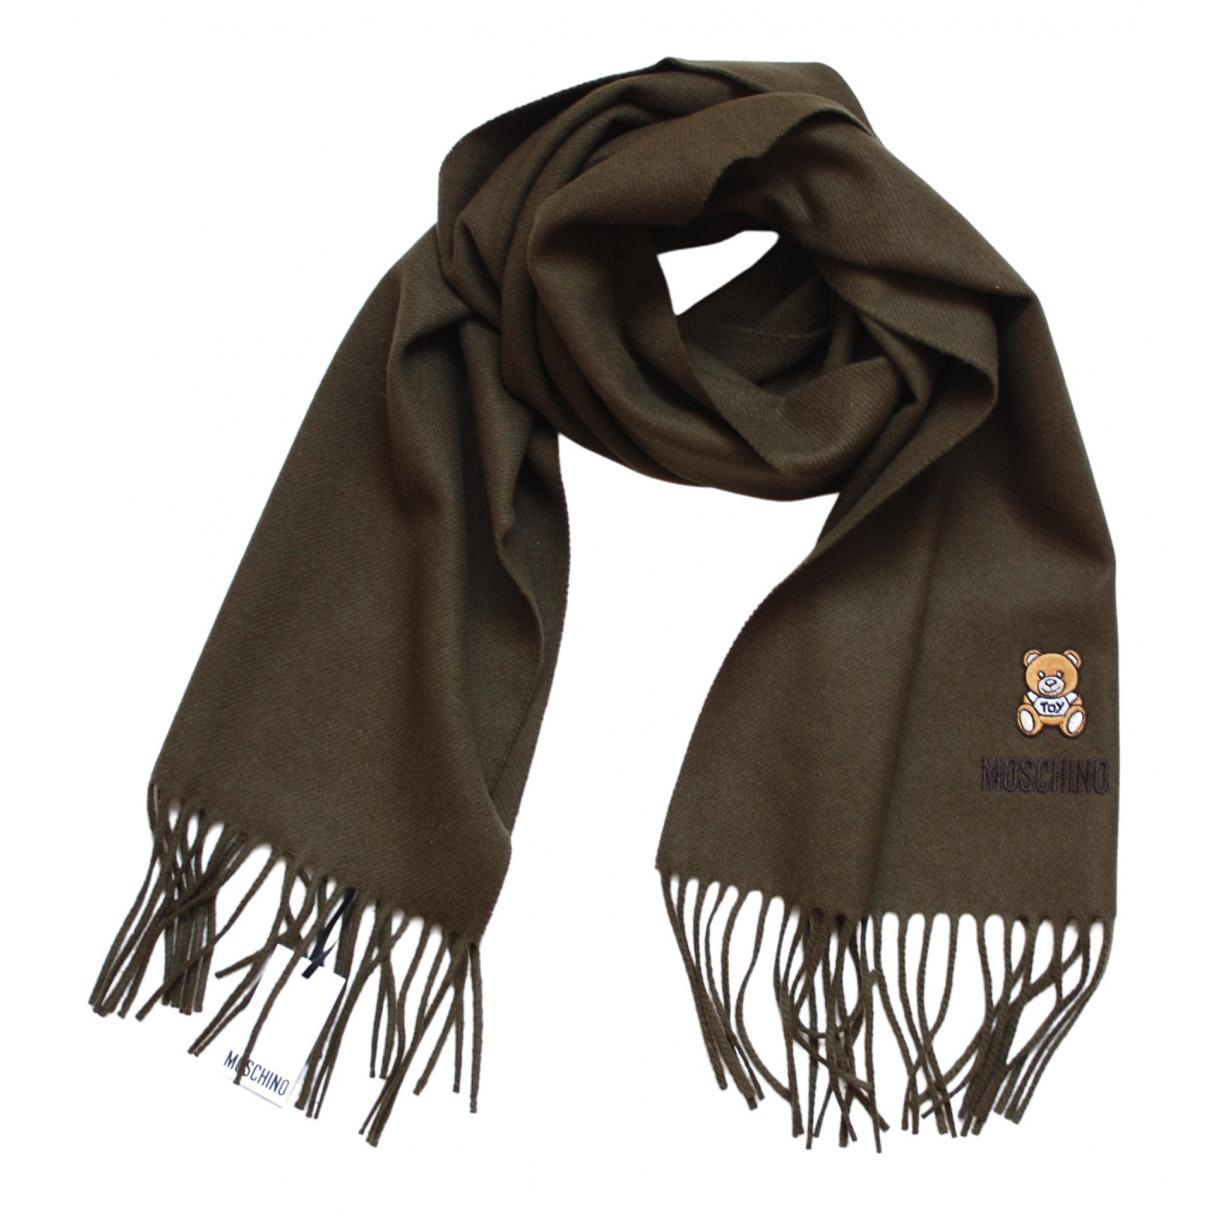 Moschino \N Schal in  Khaki Wolle